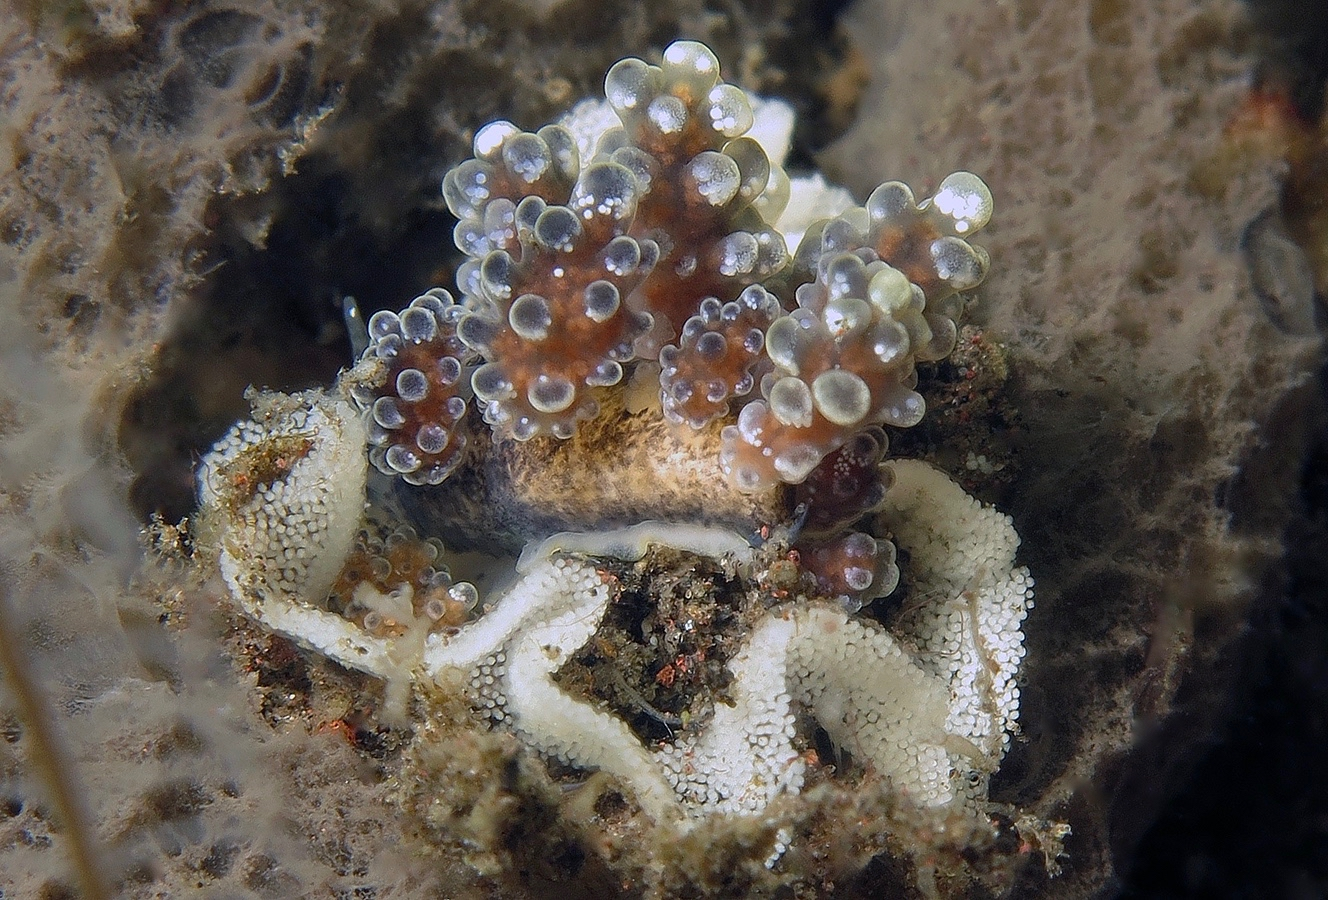 Doto sp   豆豆海蛞蝓  巴厘岛图蓝本 Tulamben 印度尼西亚 Indonesia @lazydiving.com 潜水时光